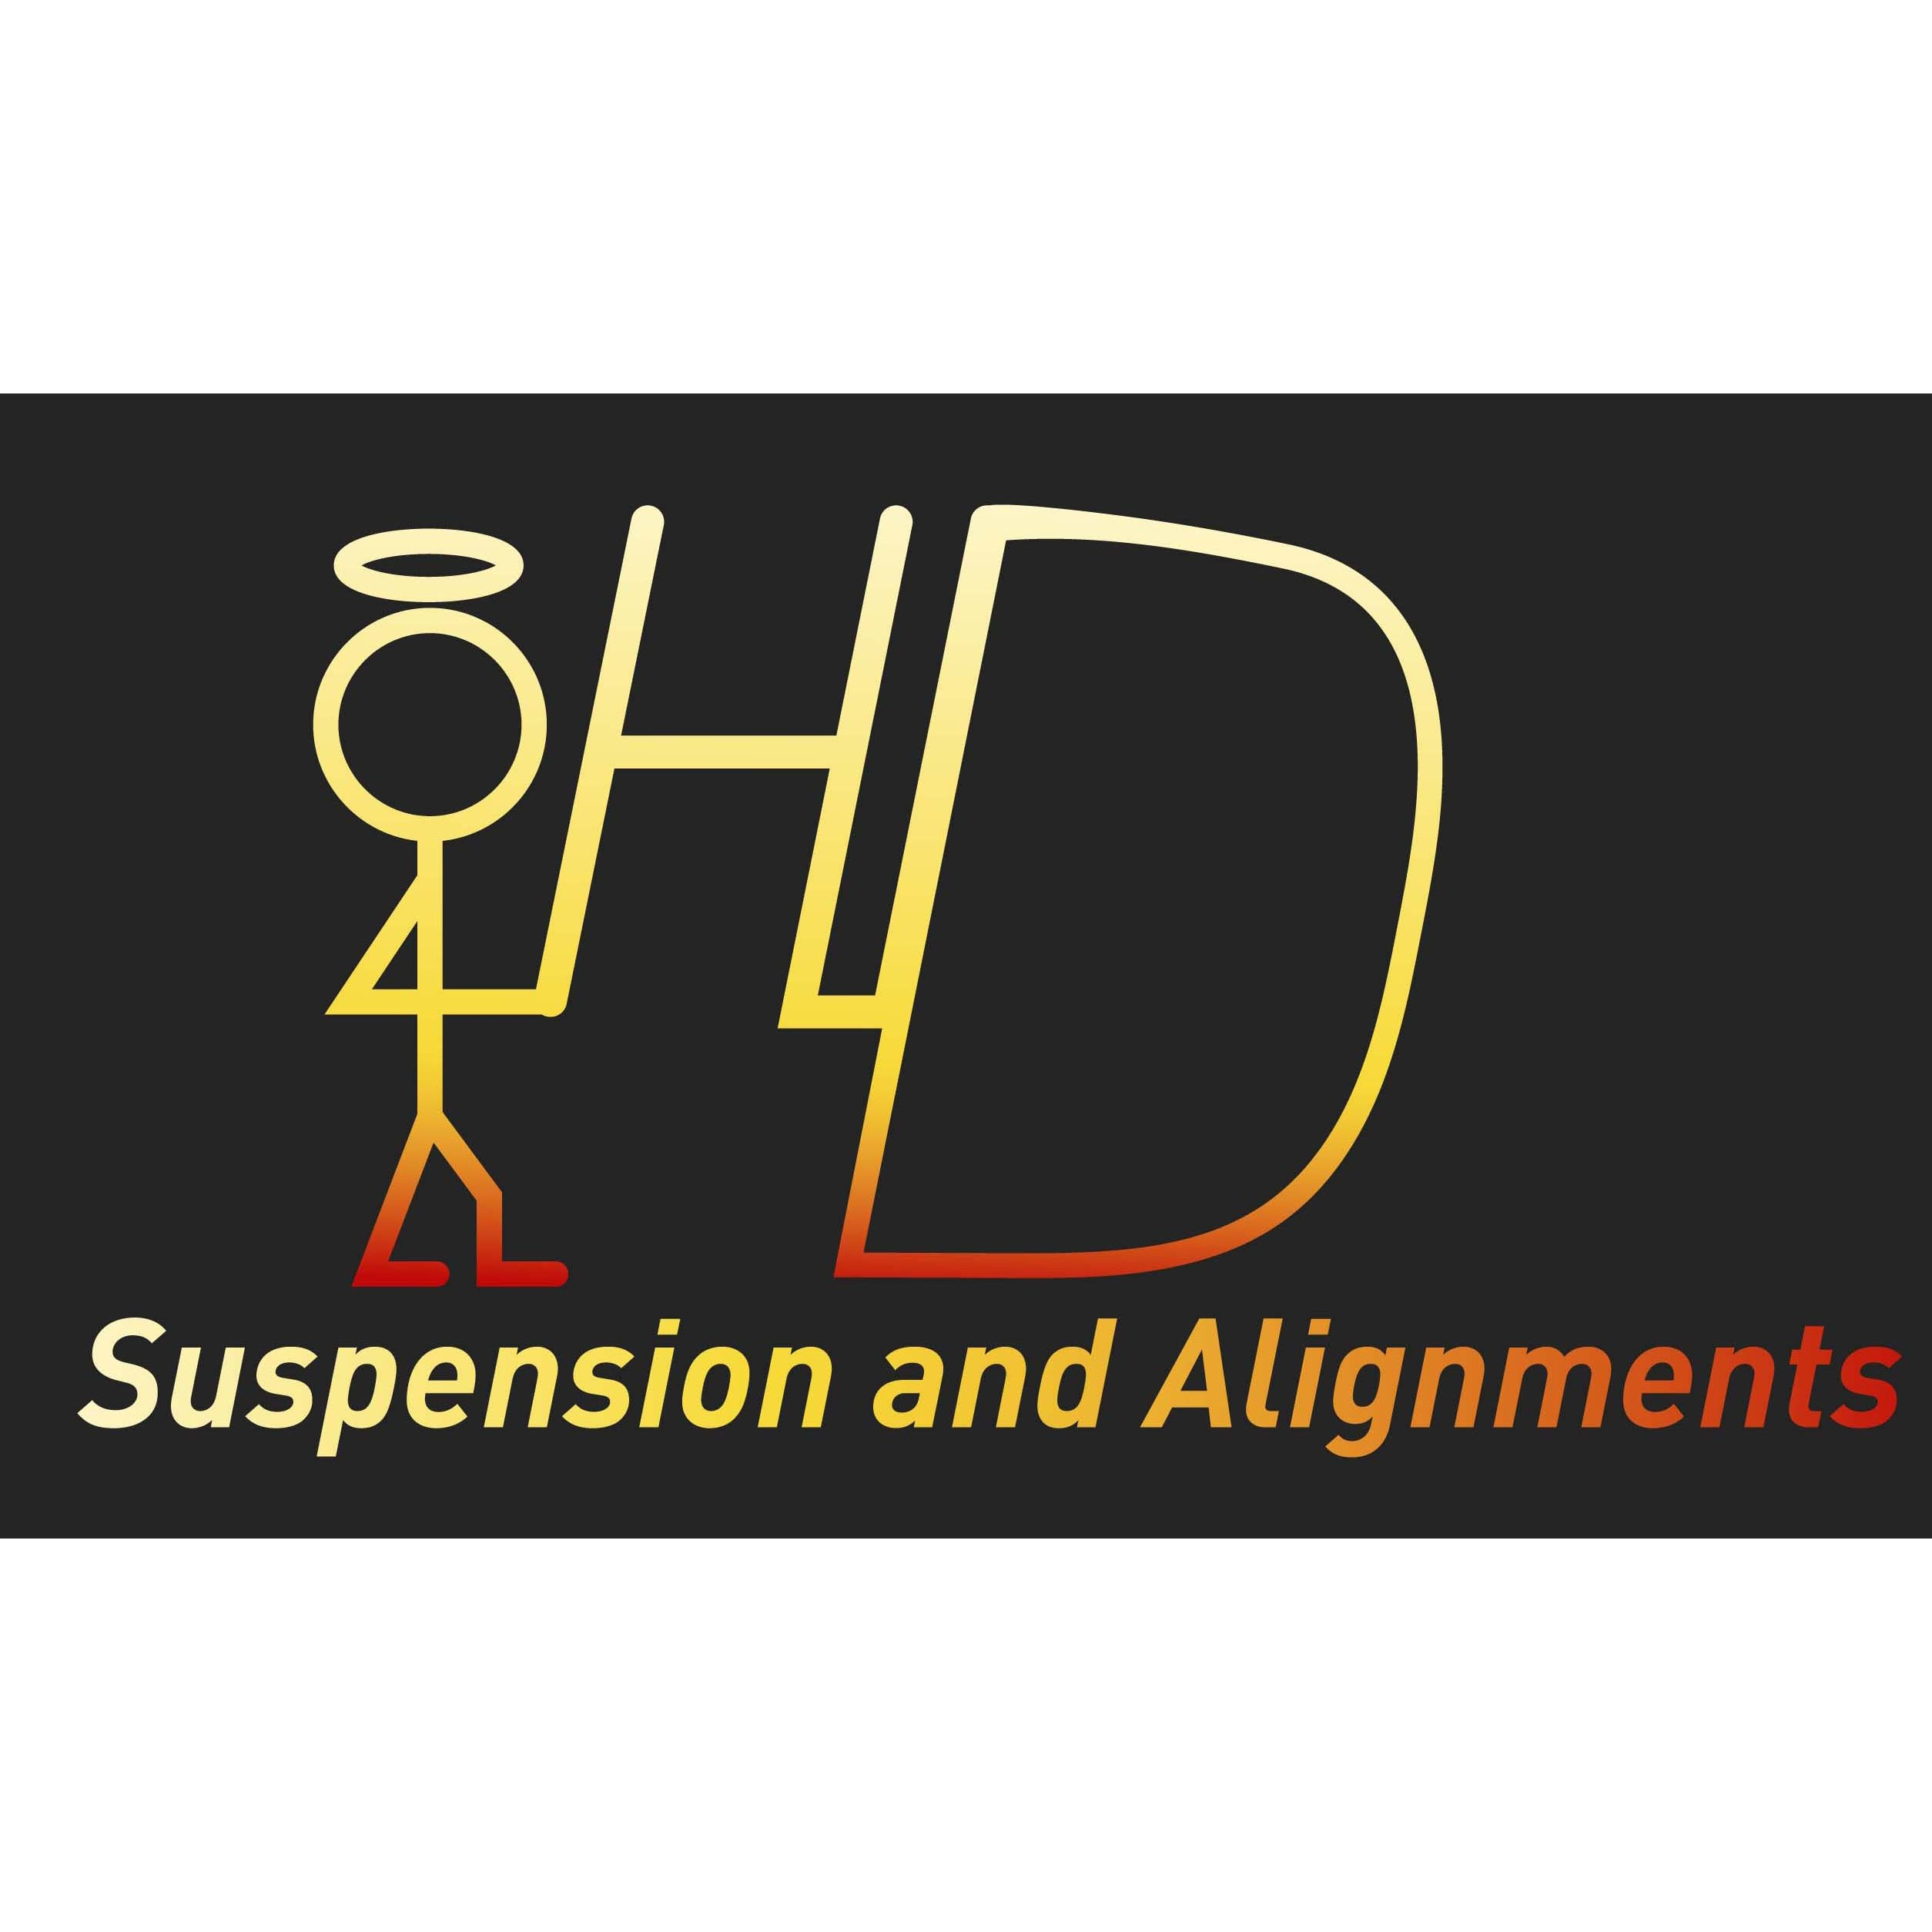 Angel's HD Suspension Alignment